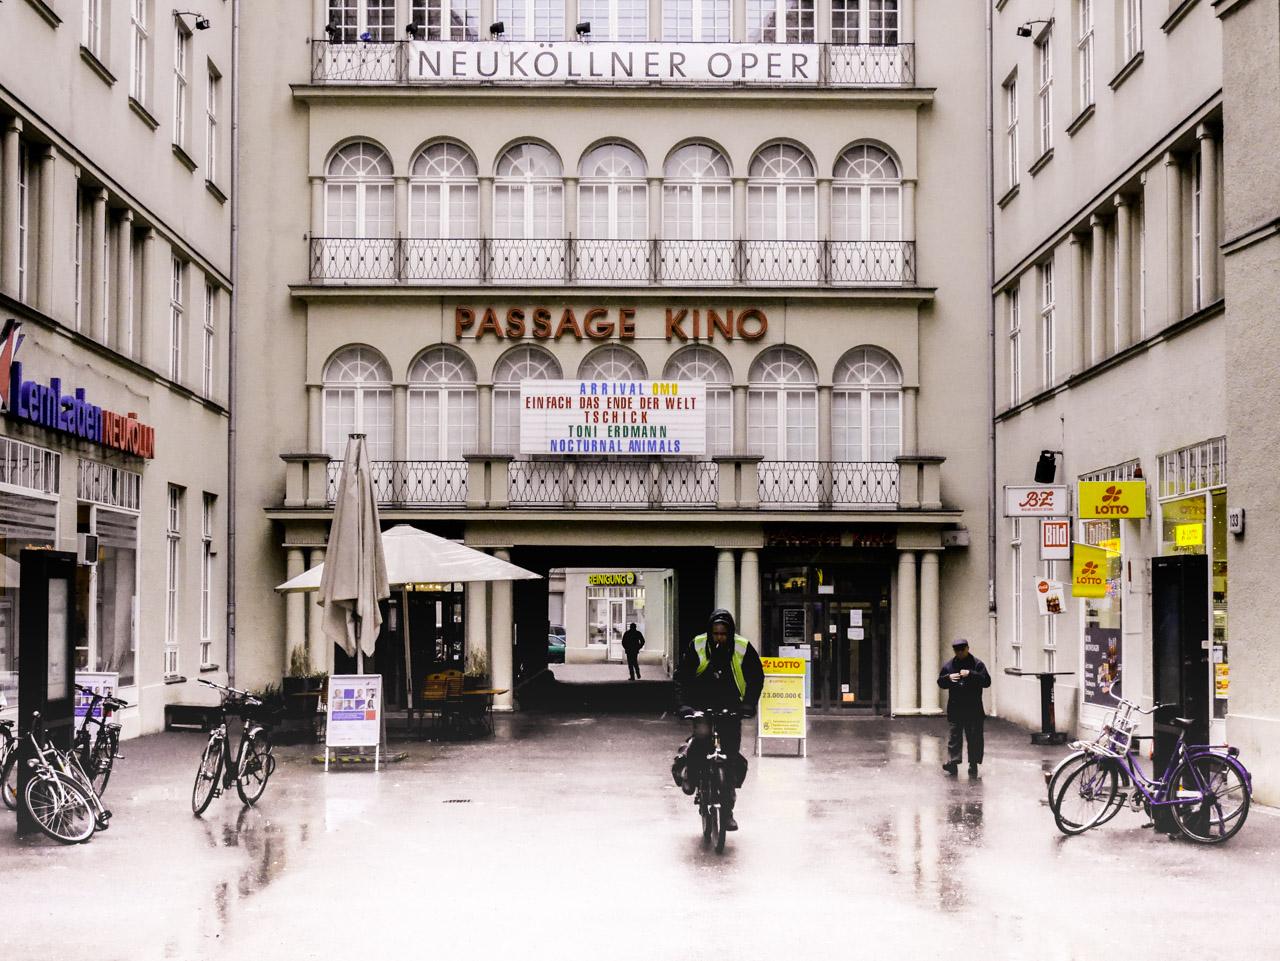 Opéra de Berlin Neukölln